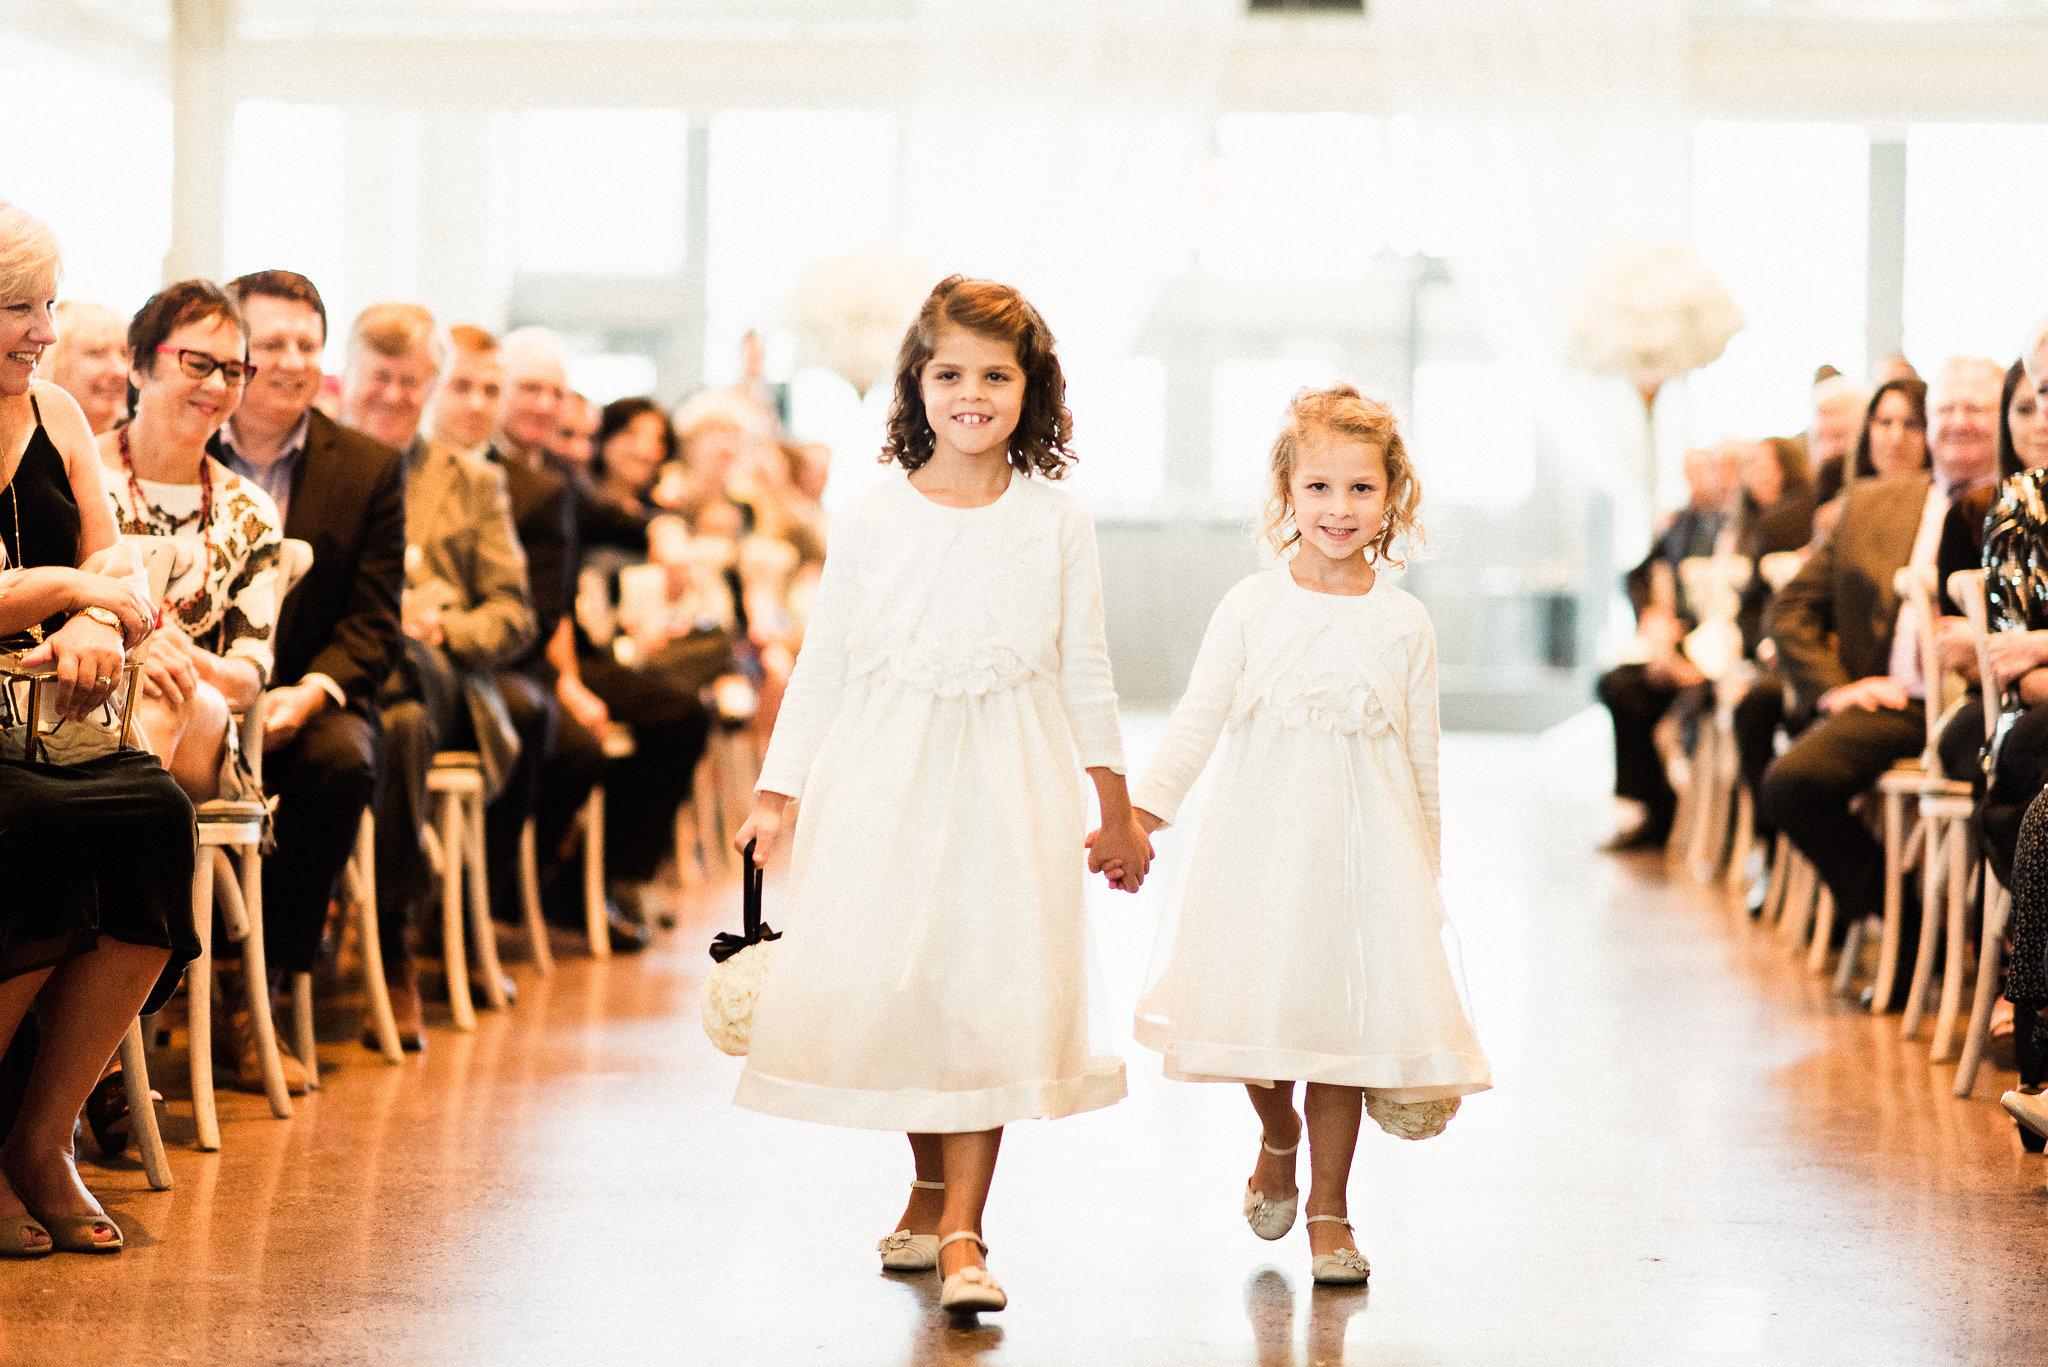 little girls walking down the aisle